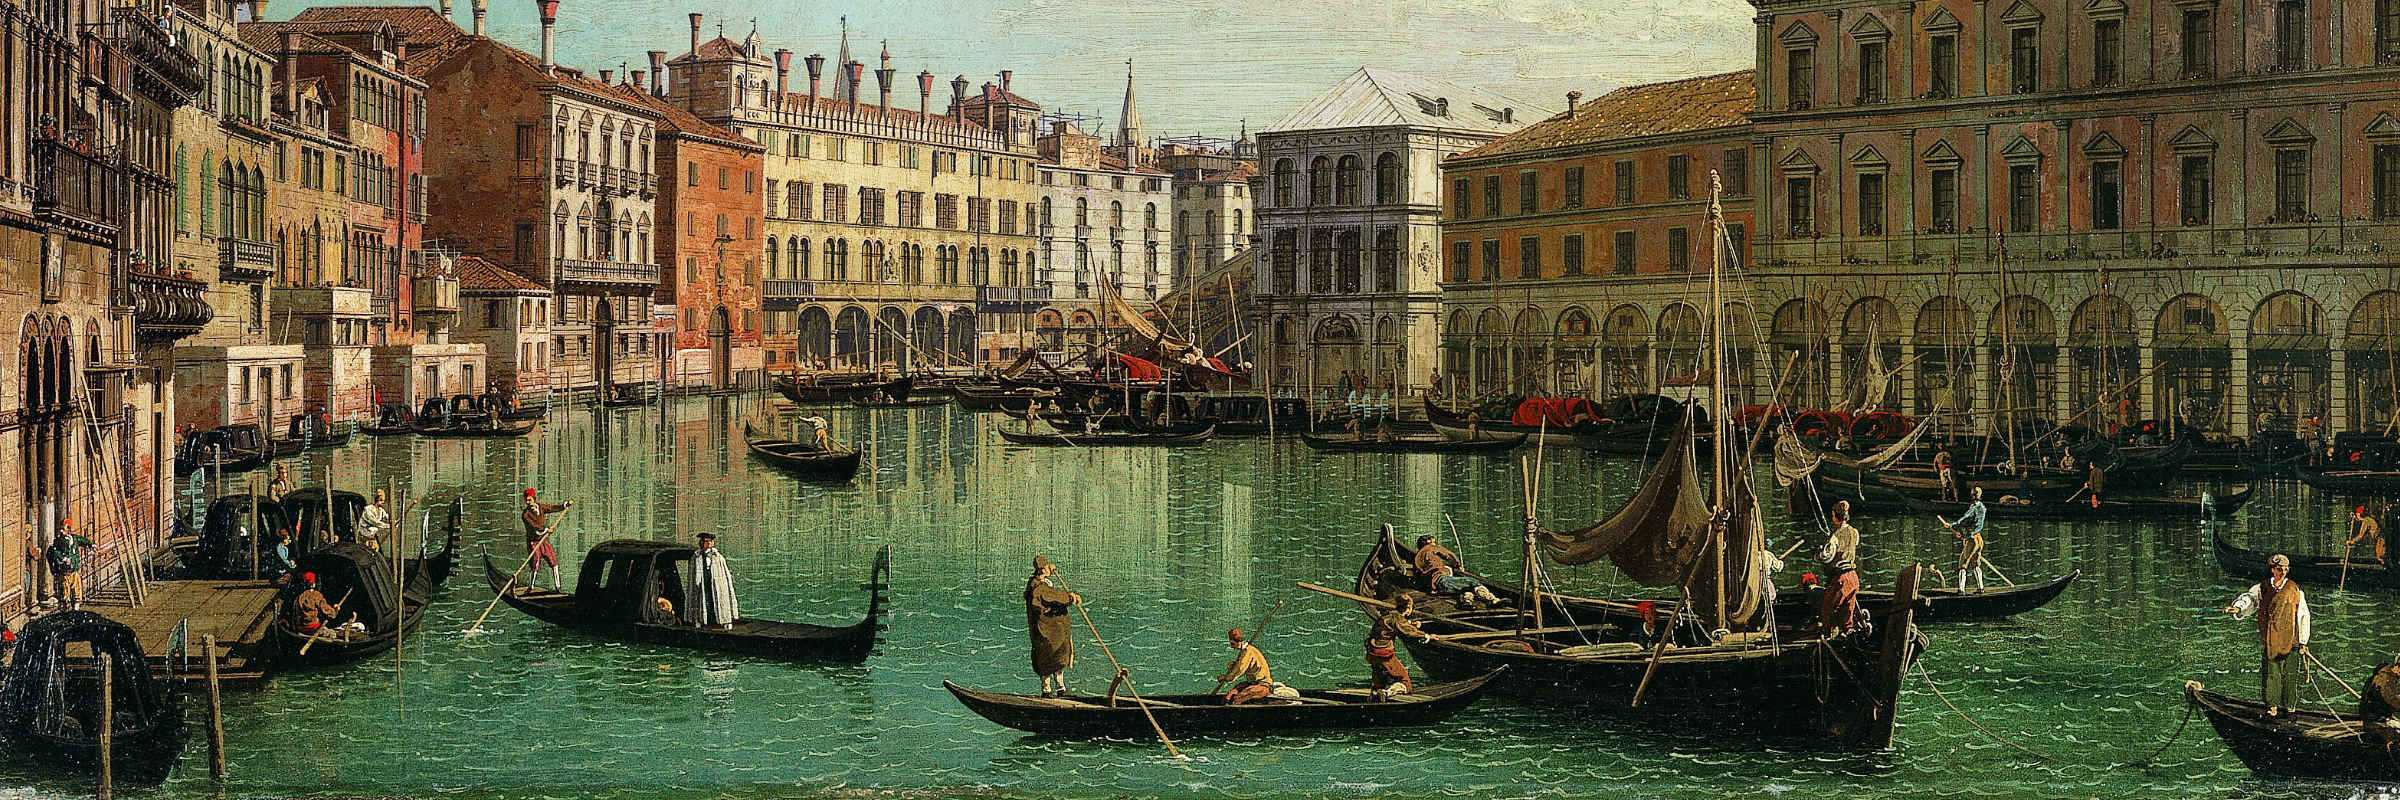 View over the Grand Canal towards Fondaco dei Tedeschi and Rialto Bridge, Canaletto (Giovanni Antonio Canal), 1730 - (Metropolitan Museum of New York)